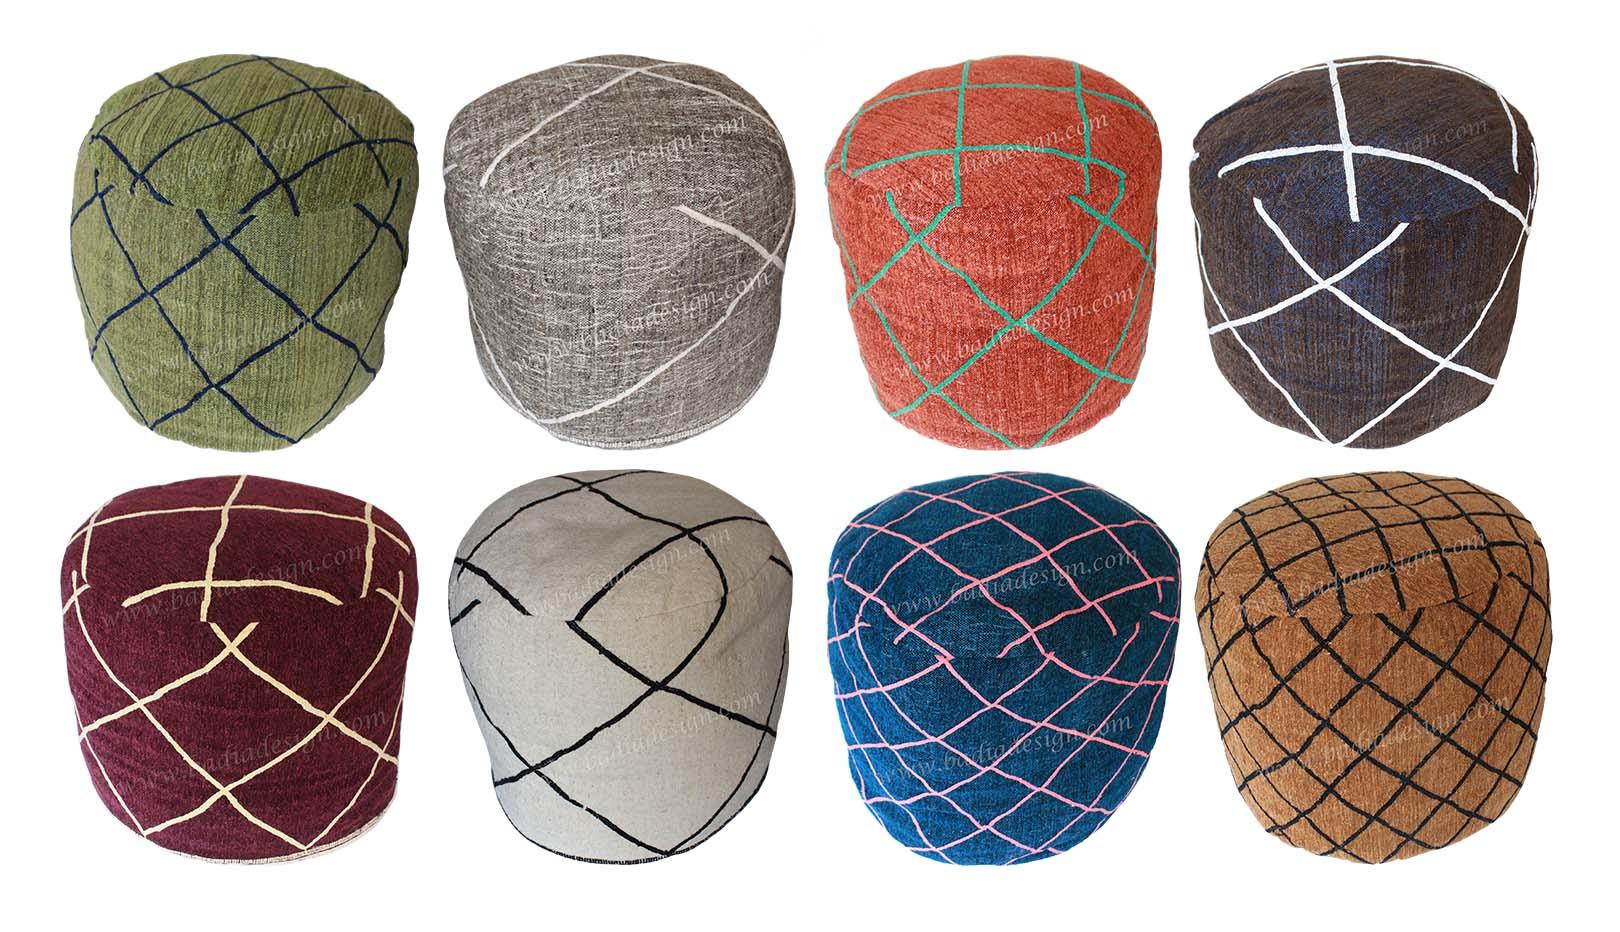 moroccan-wool-fabric-pouf-fp032.jpg